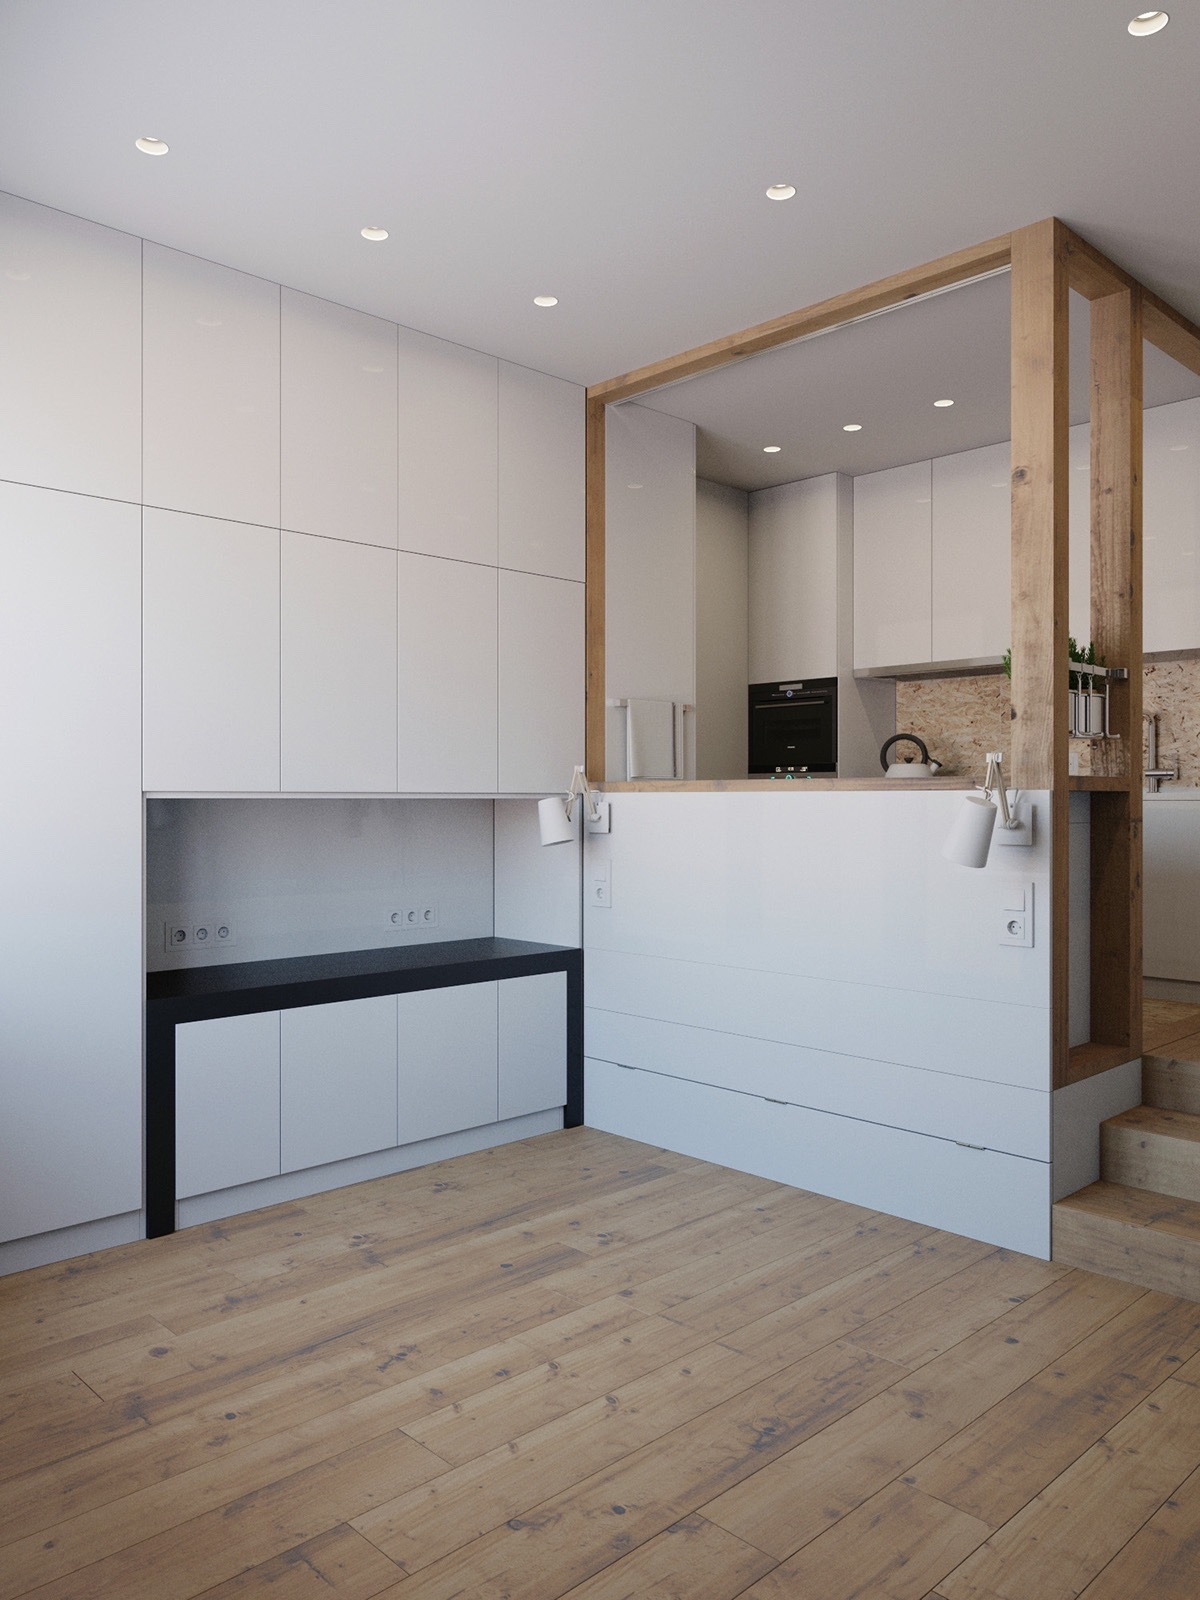 Small Kitchen Units Designs